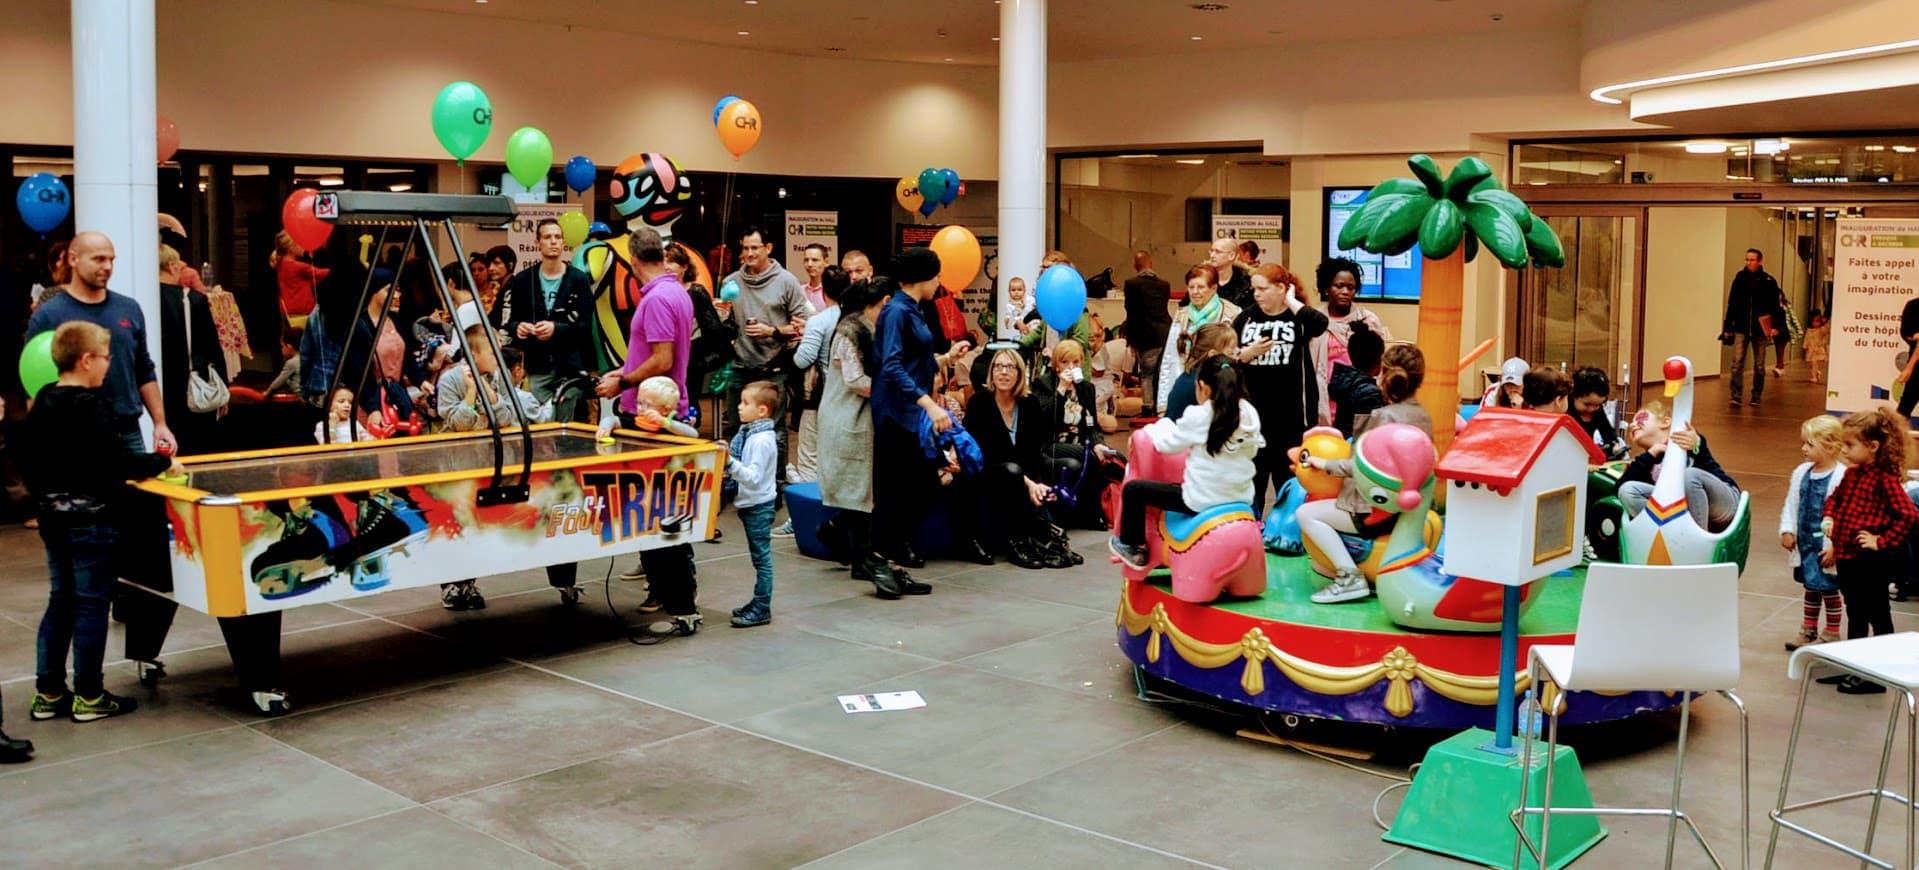 Espace Fête Foraine Kermesse By GHLBEnbspGHL EVENTS